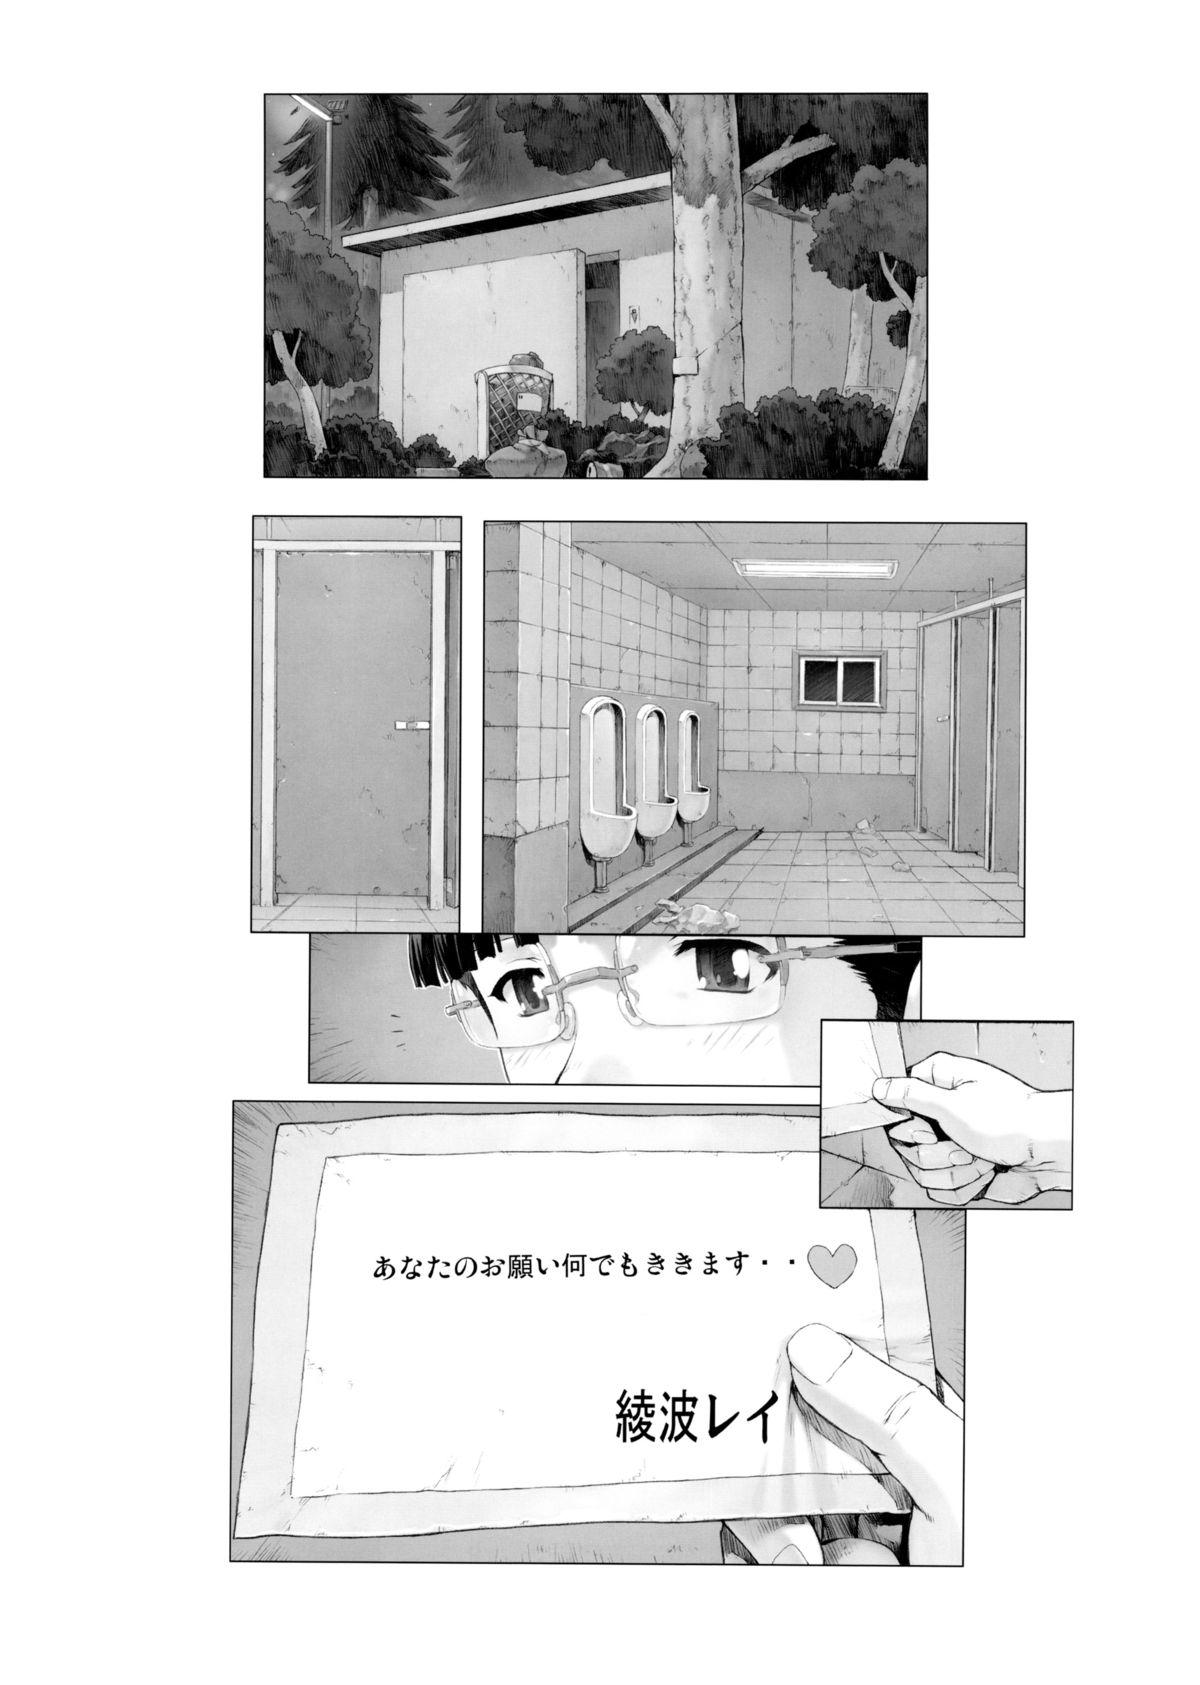 Ayanami Dai 4 Kai + Omake Bon + Postcard 1